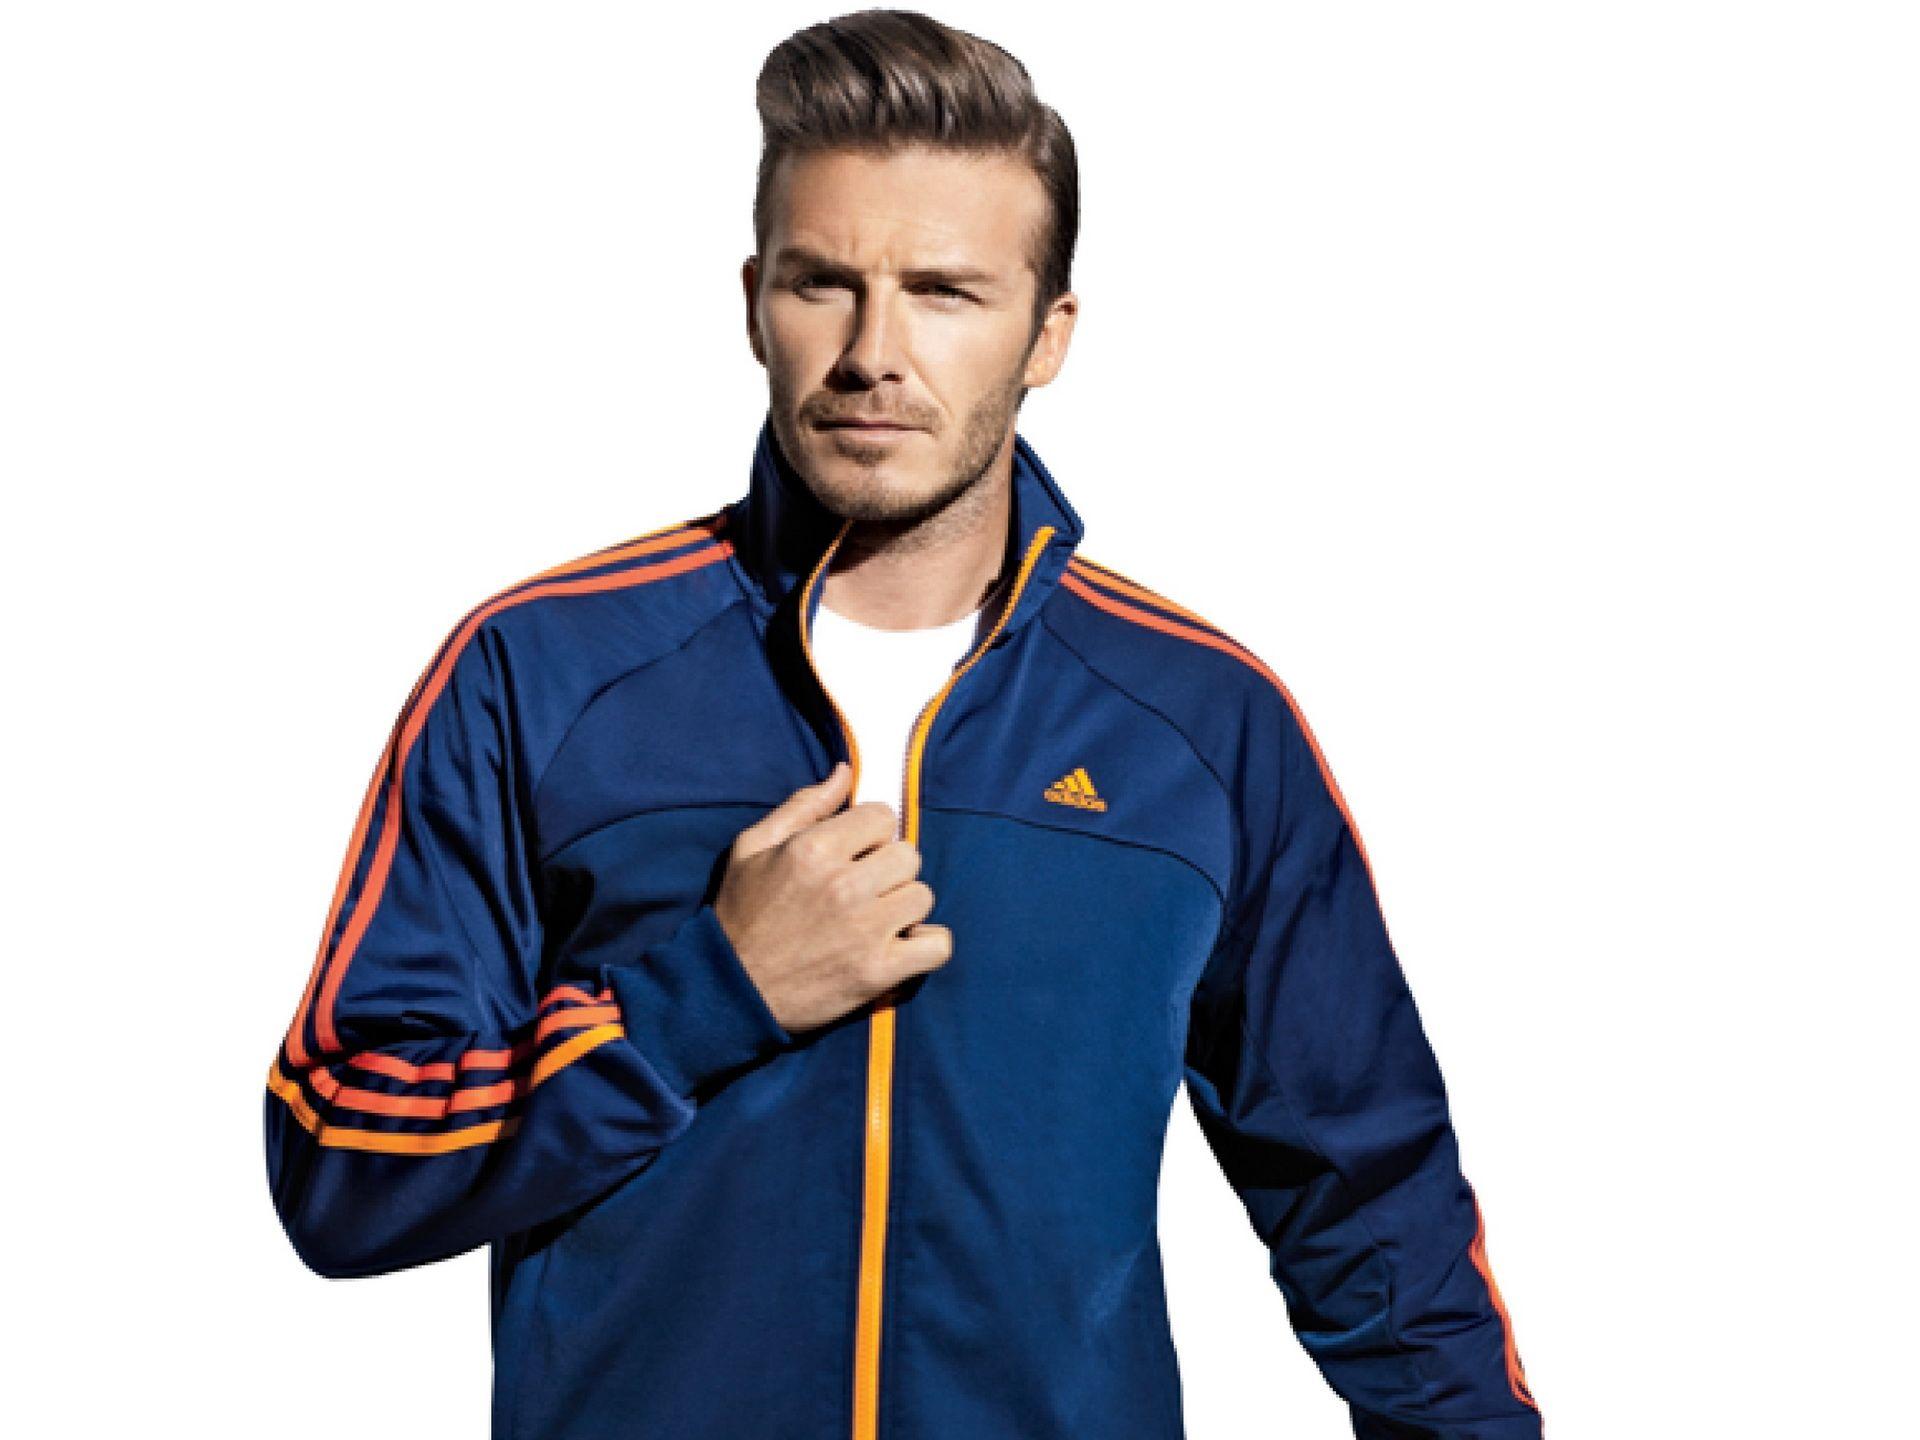 American Football Quotes Wallpaper David Beckham Blue Adidas David Beckham Wallpaper